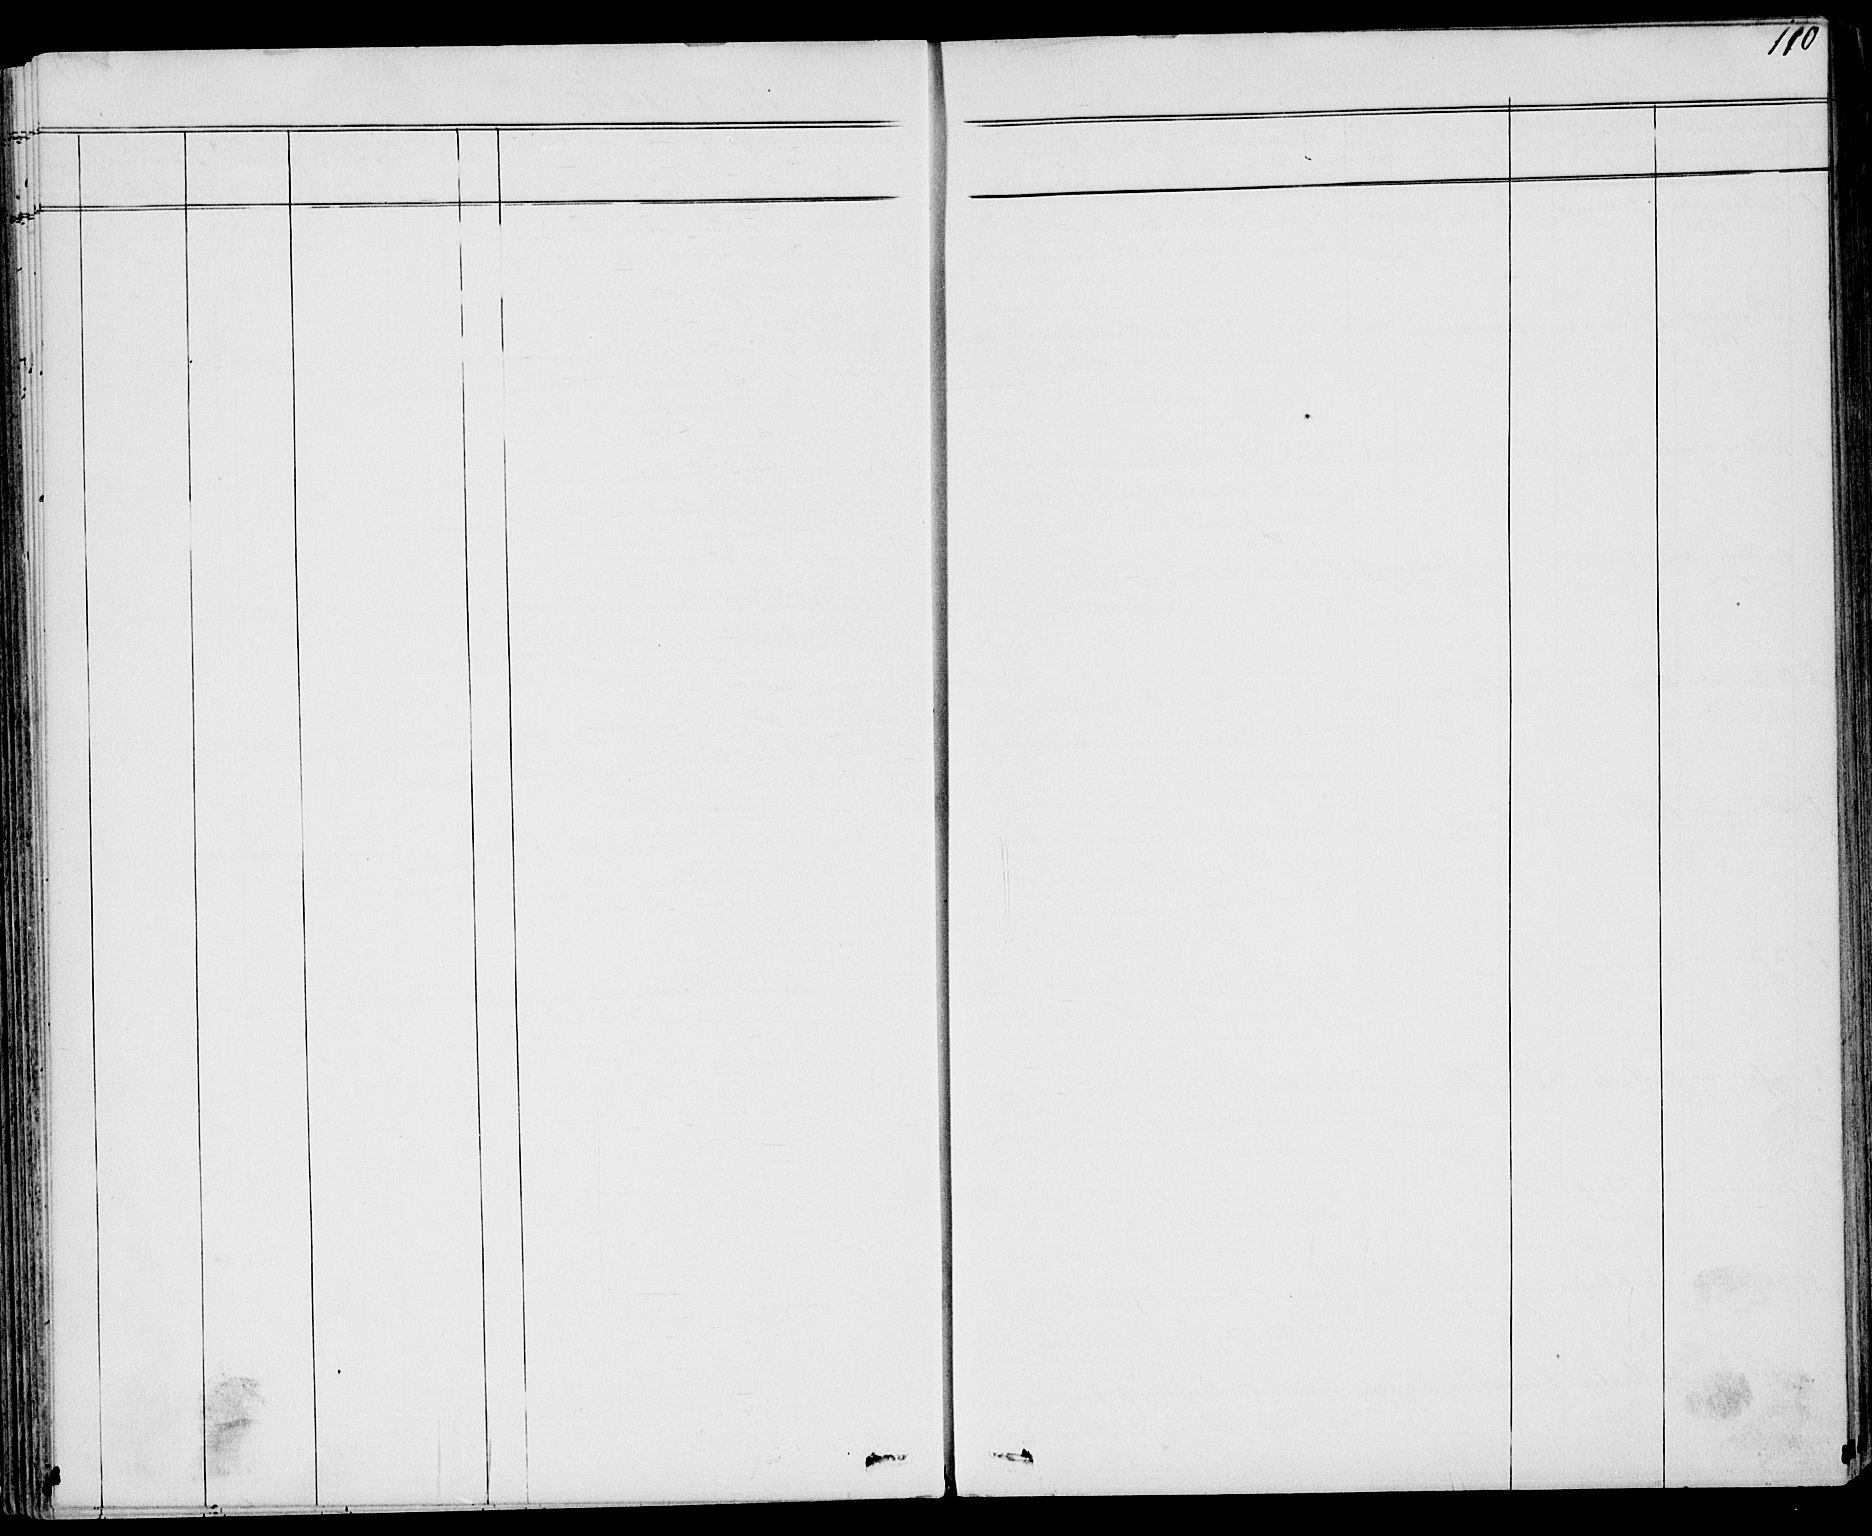 SAKO, Drangedal kirkebøker, G/Gb/L0001: Klokkerbok nr. II 1, 1856-1894, s. 110